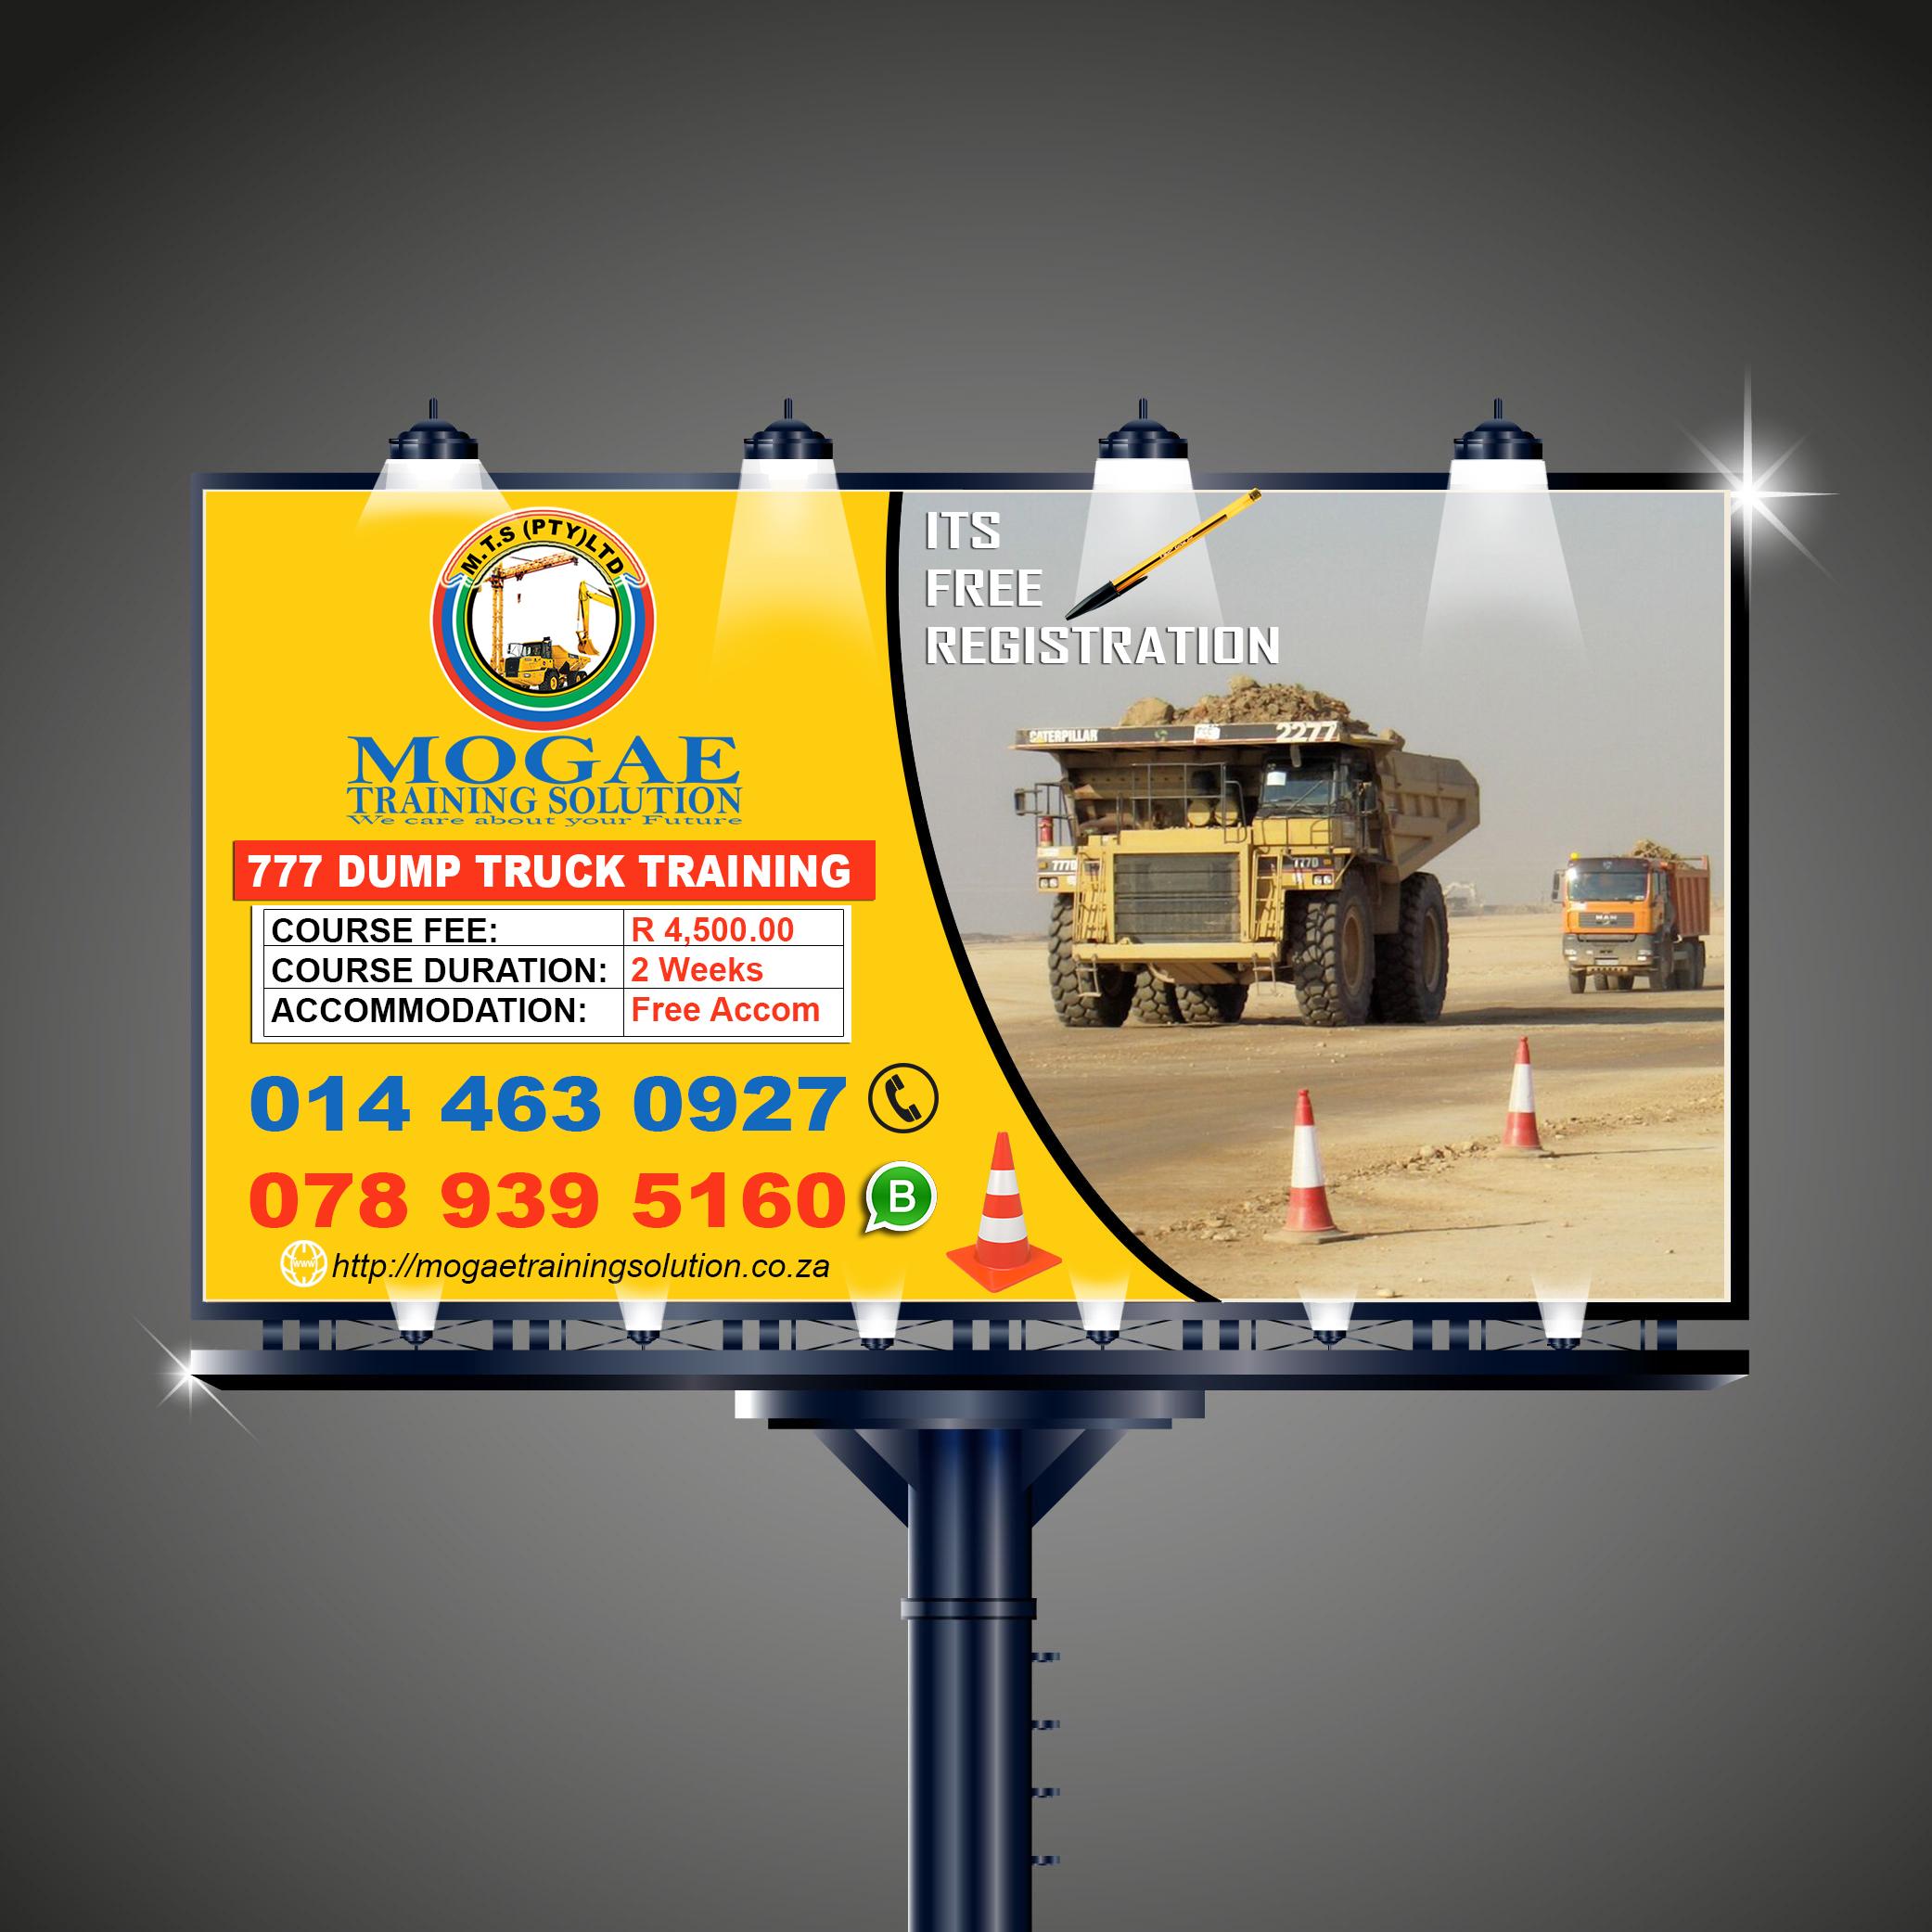 777 Dump Truck Training in Kimberley 0712613657